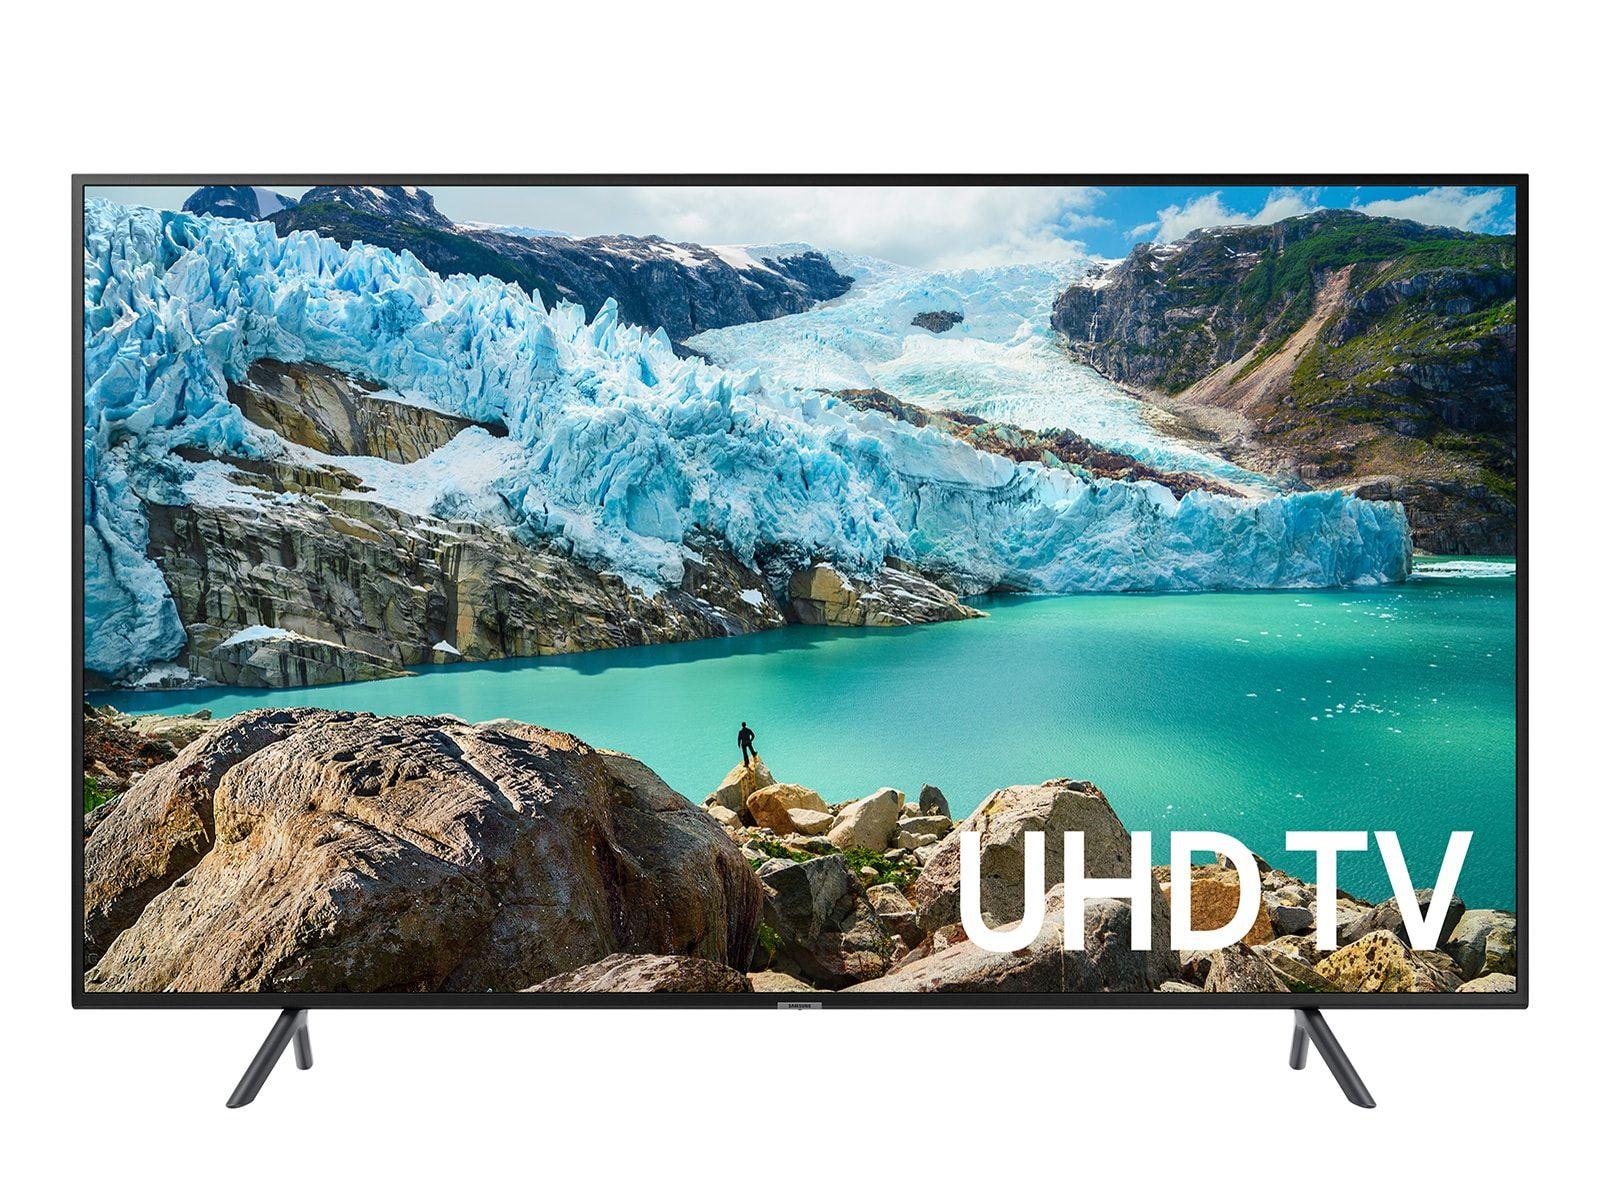 58 Class Ru7100 Smart 4k Uhd Tv 2019 In 2020 Samsung Smart Tv